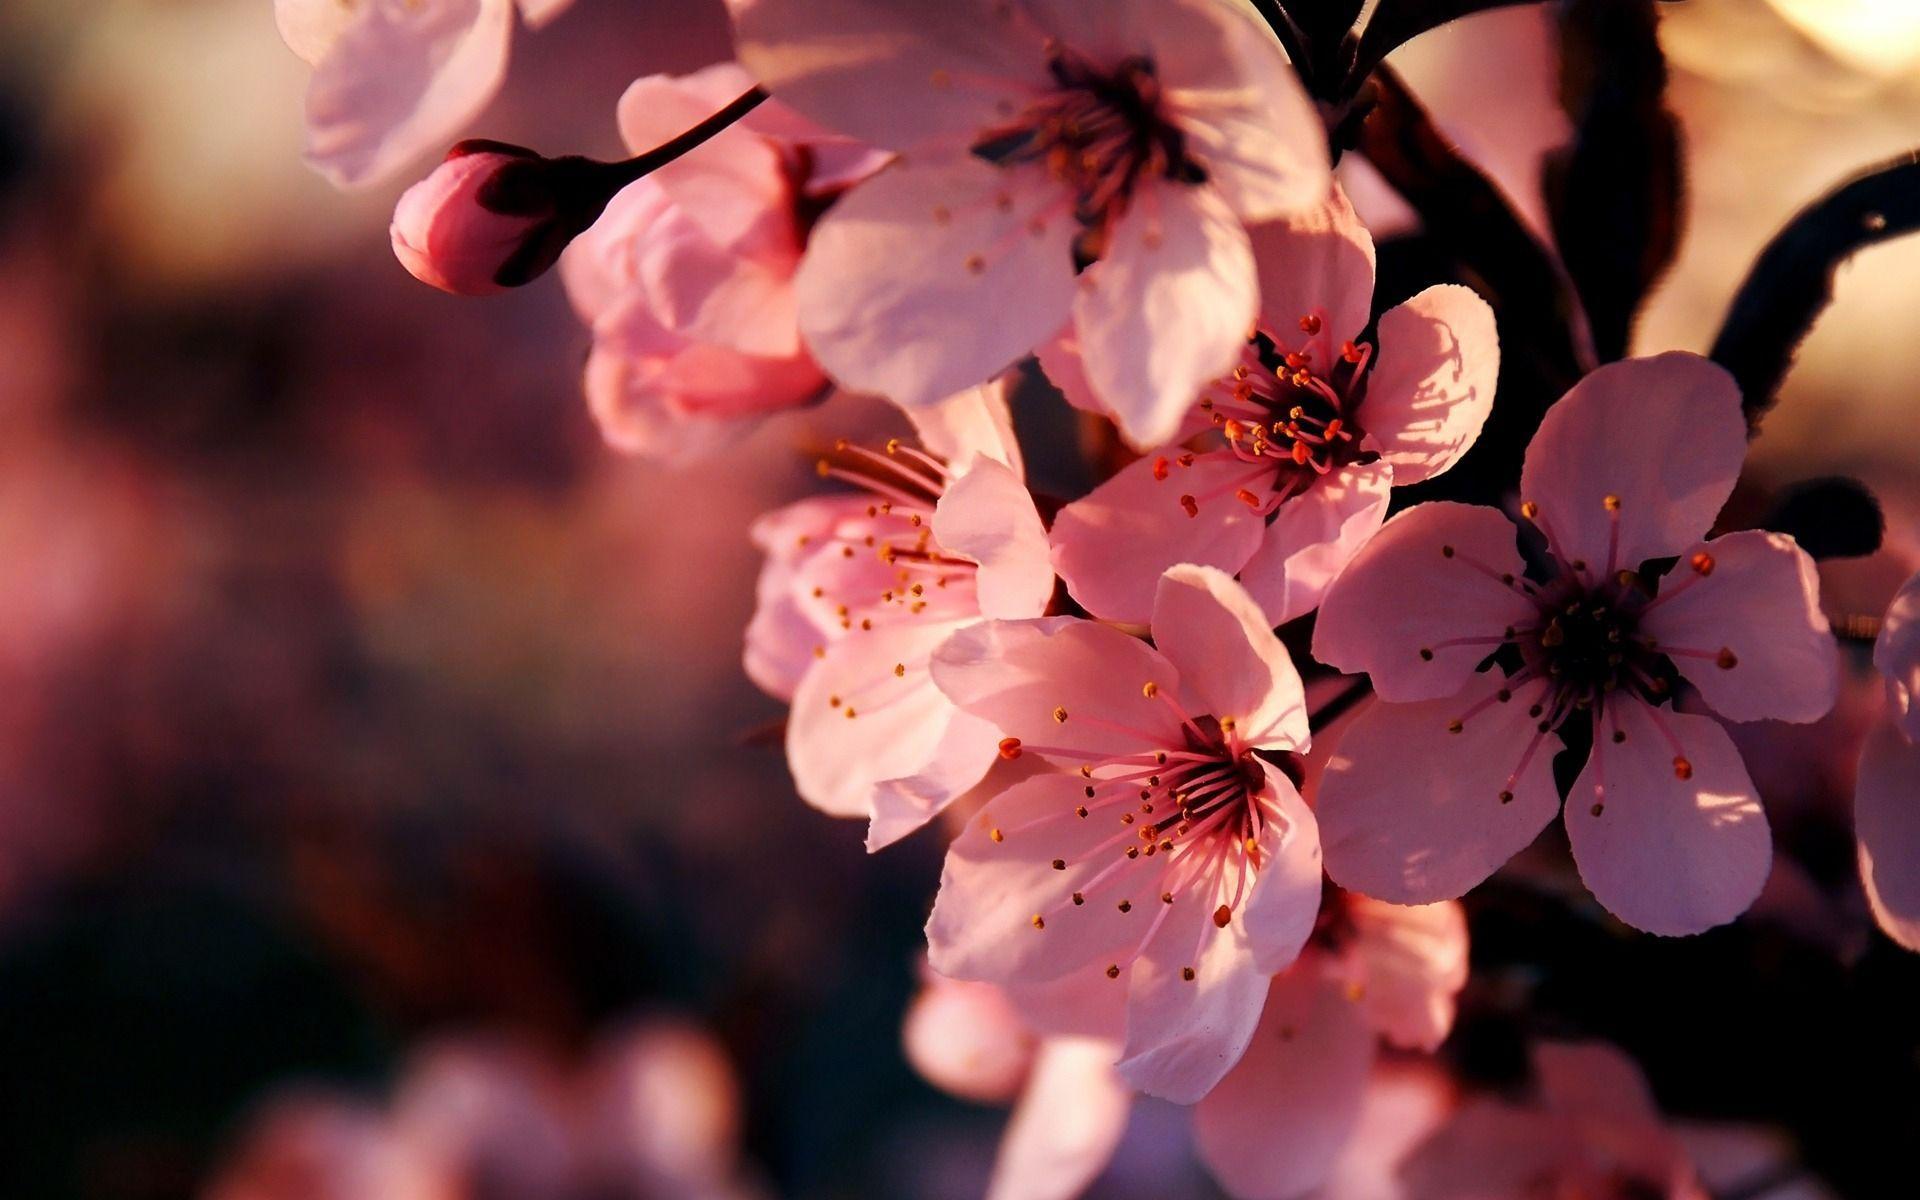 Flower Desktop Wallpapers Top Free Flower Desktop Backgrounds Wallpaperaccess